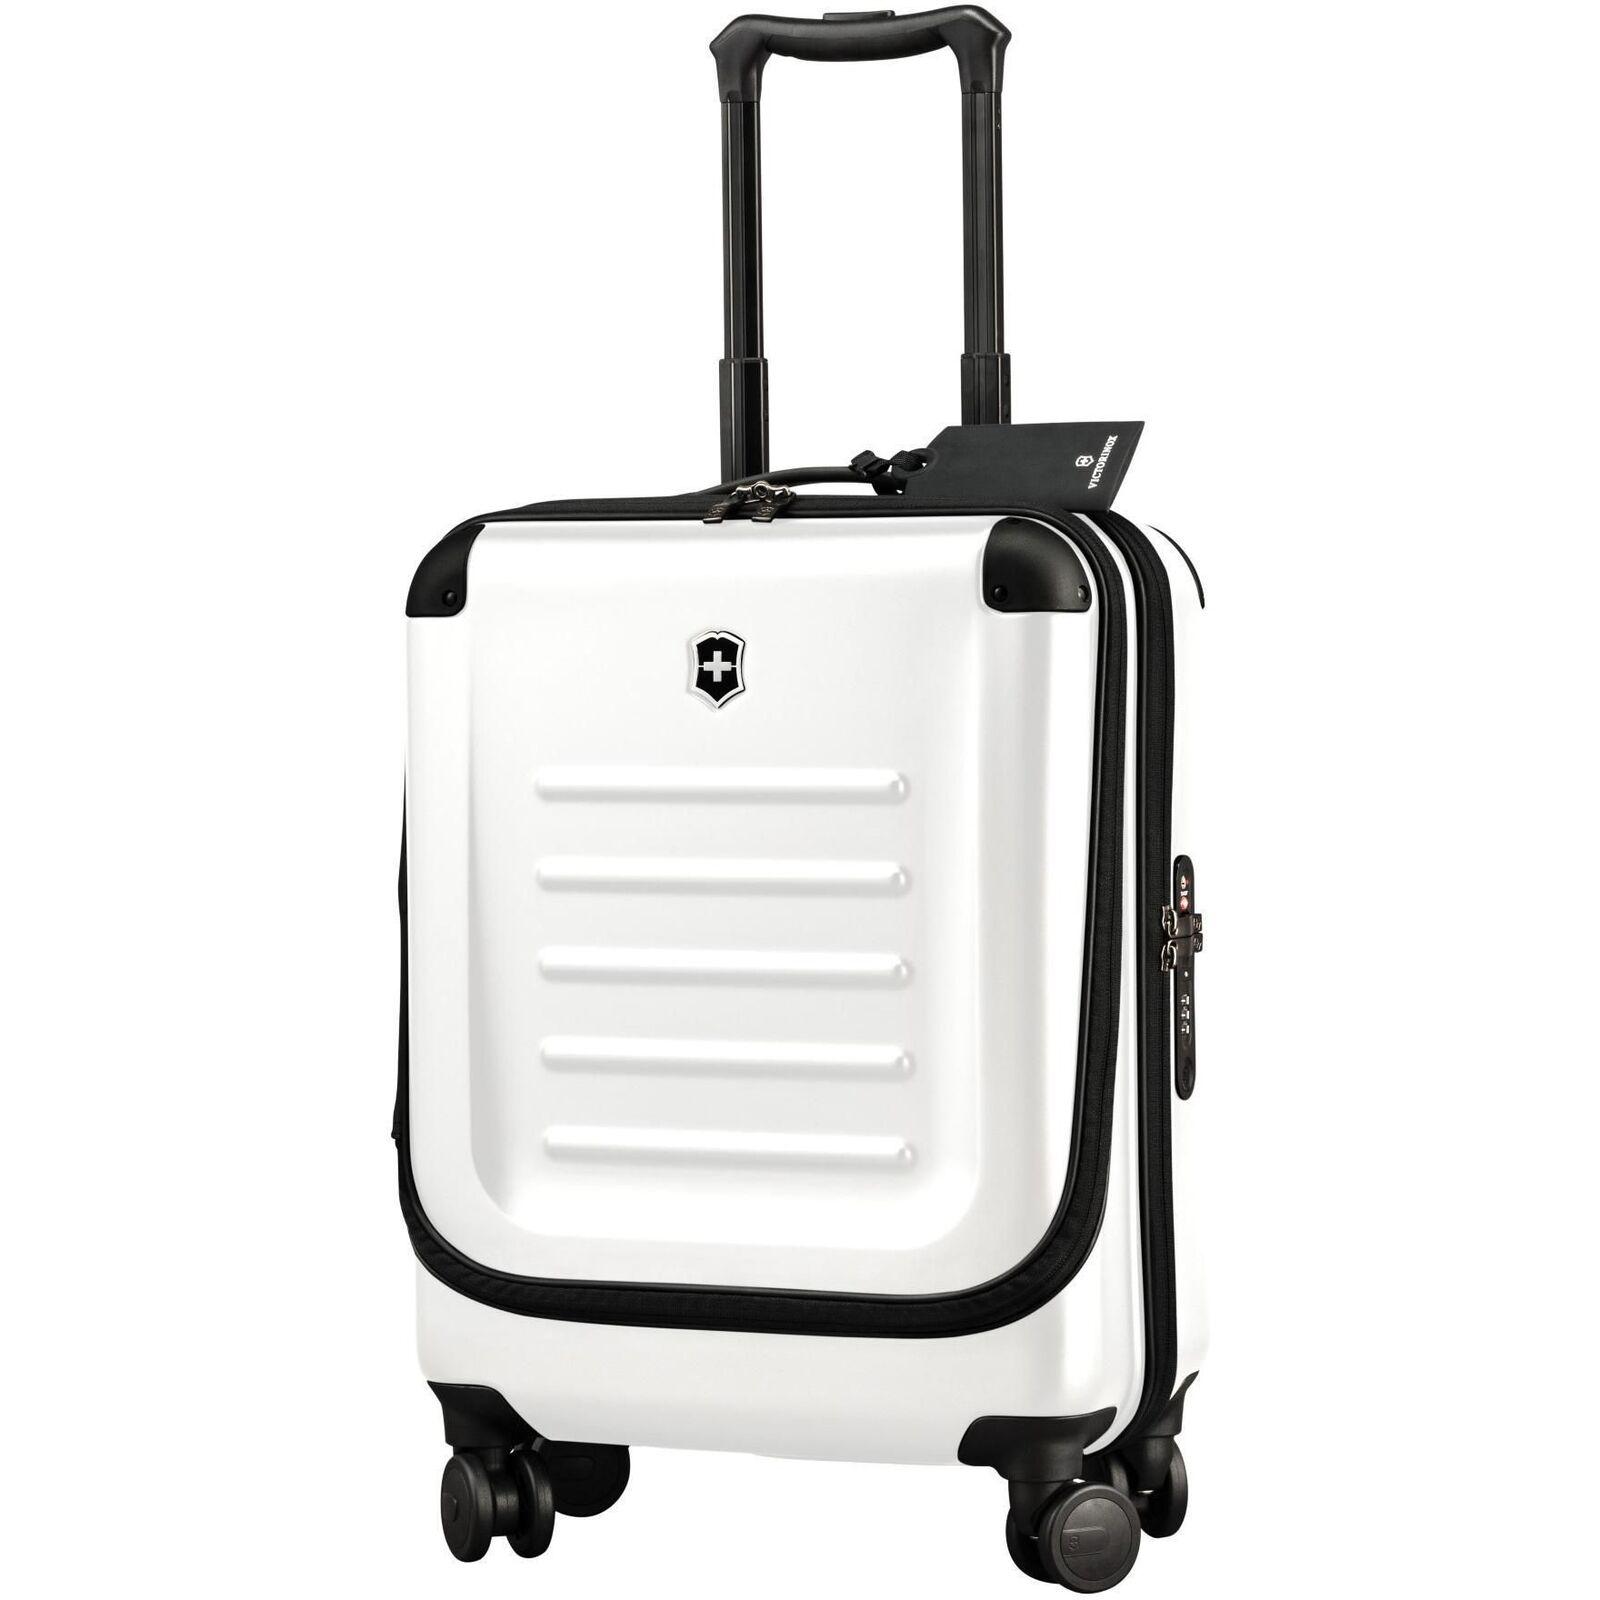 Victorinox Spectra 2.0 DualAccess Global CarryOn 4RollenKabinentrolley